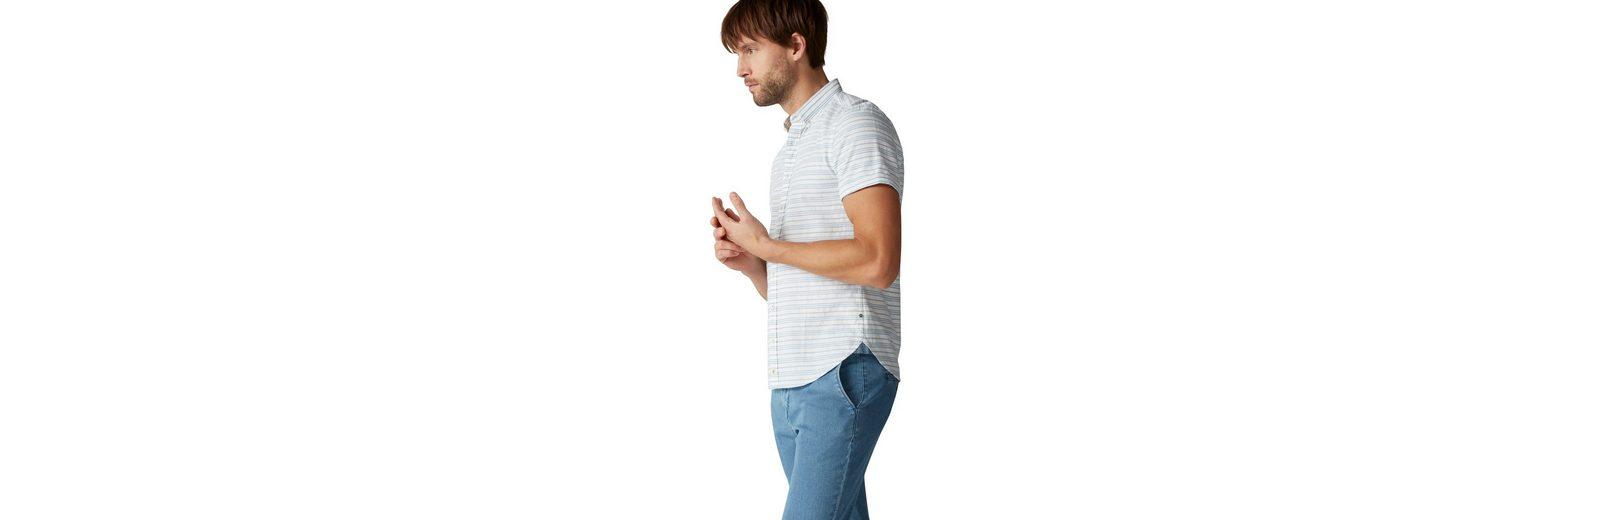 Marc O'Polo Kurzarmhemd Qualitativ Hochwertige Online RoEAEp2